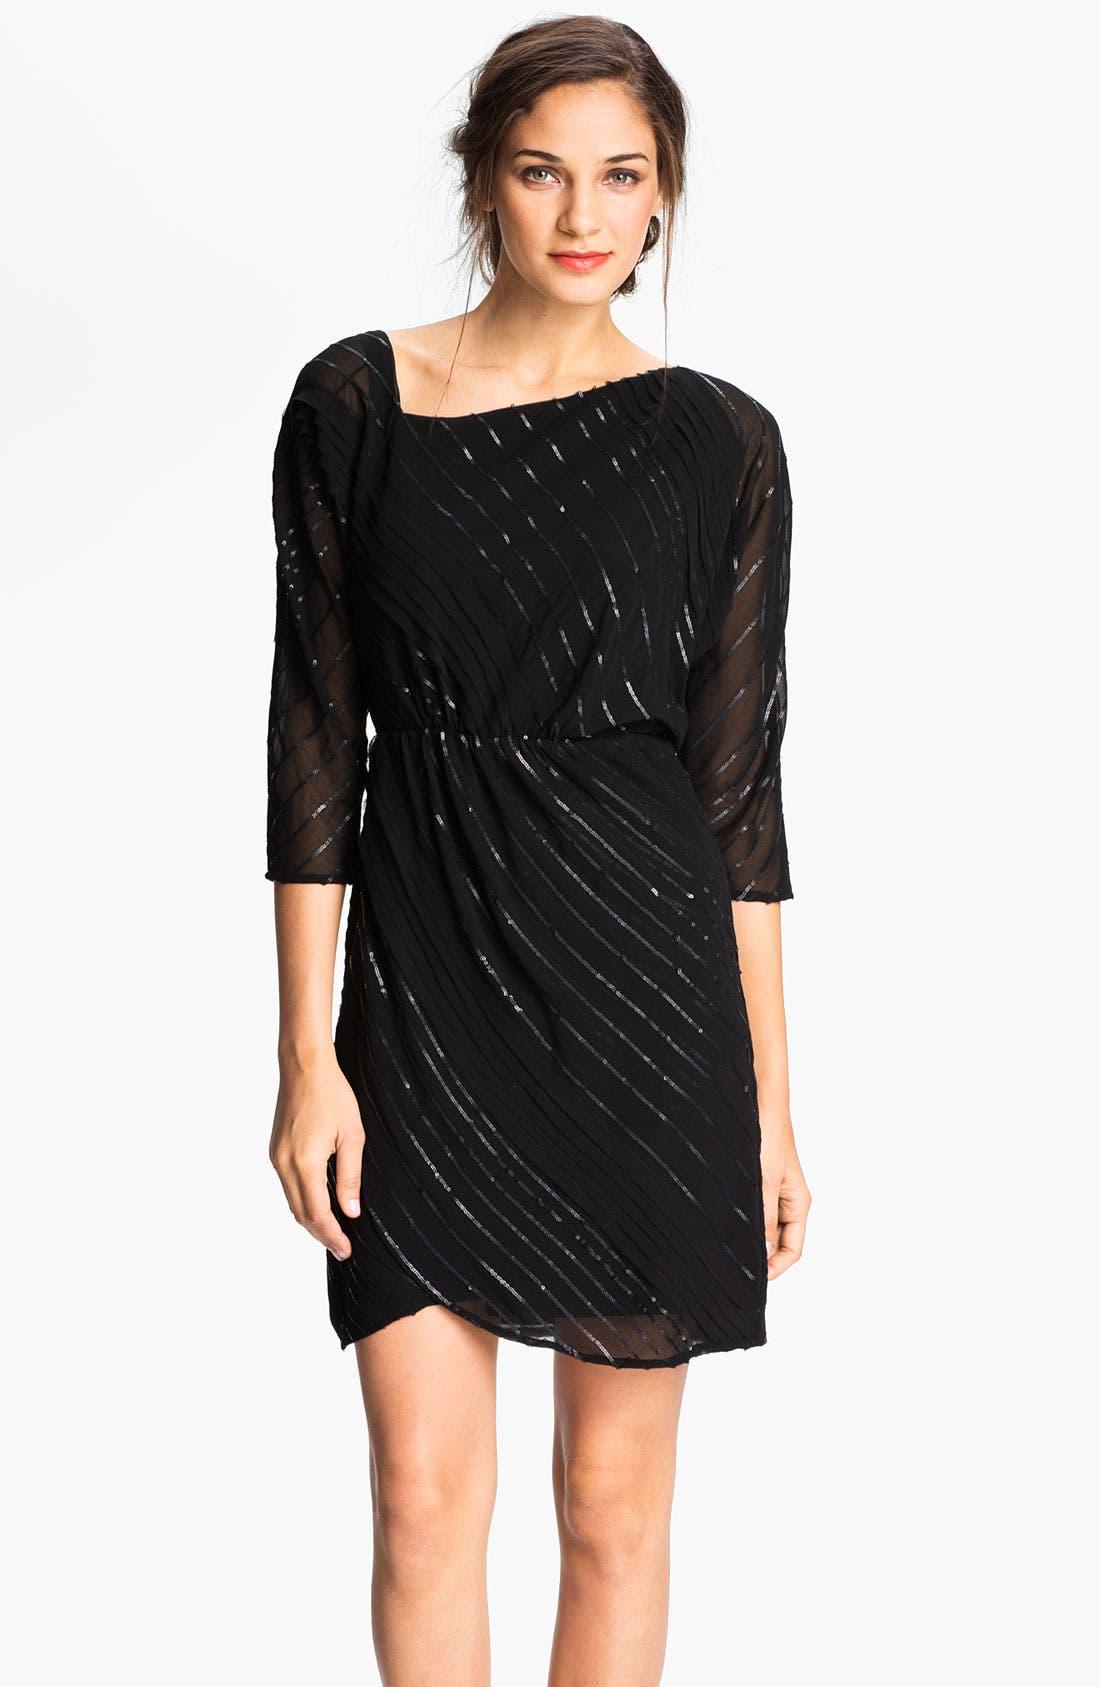 Alternate Image 1 Selected - Vince Camuto Sequin Stripe Chiffon Dress